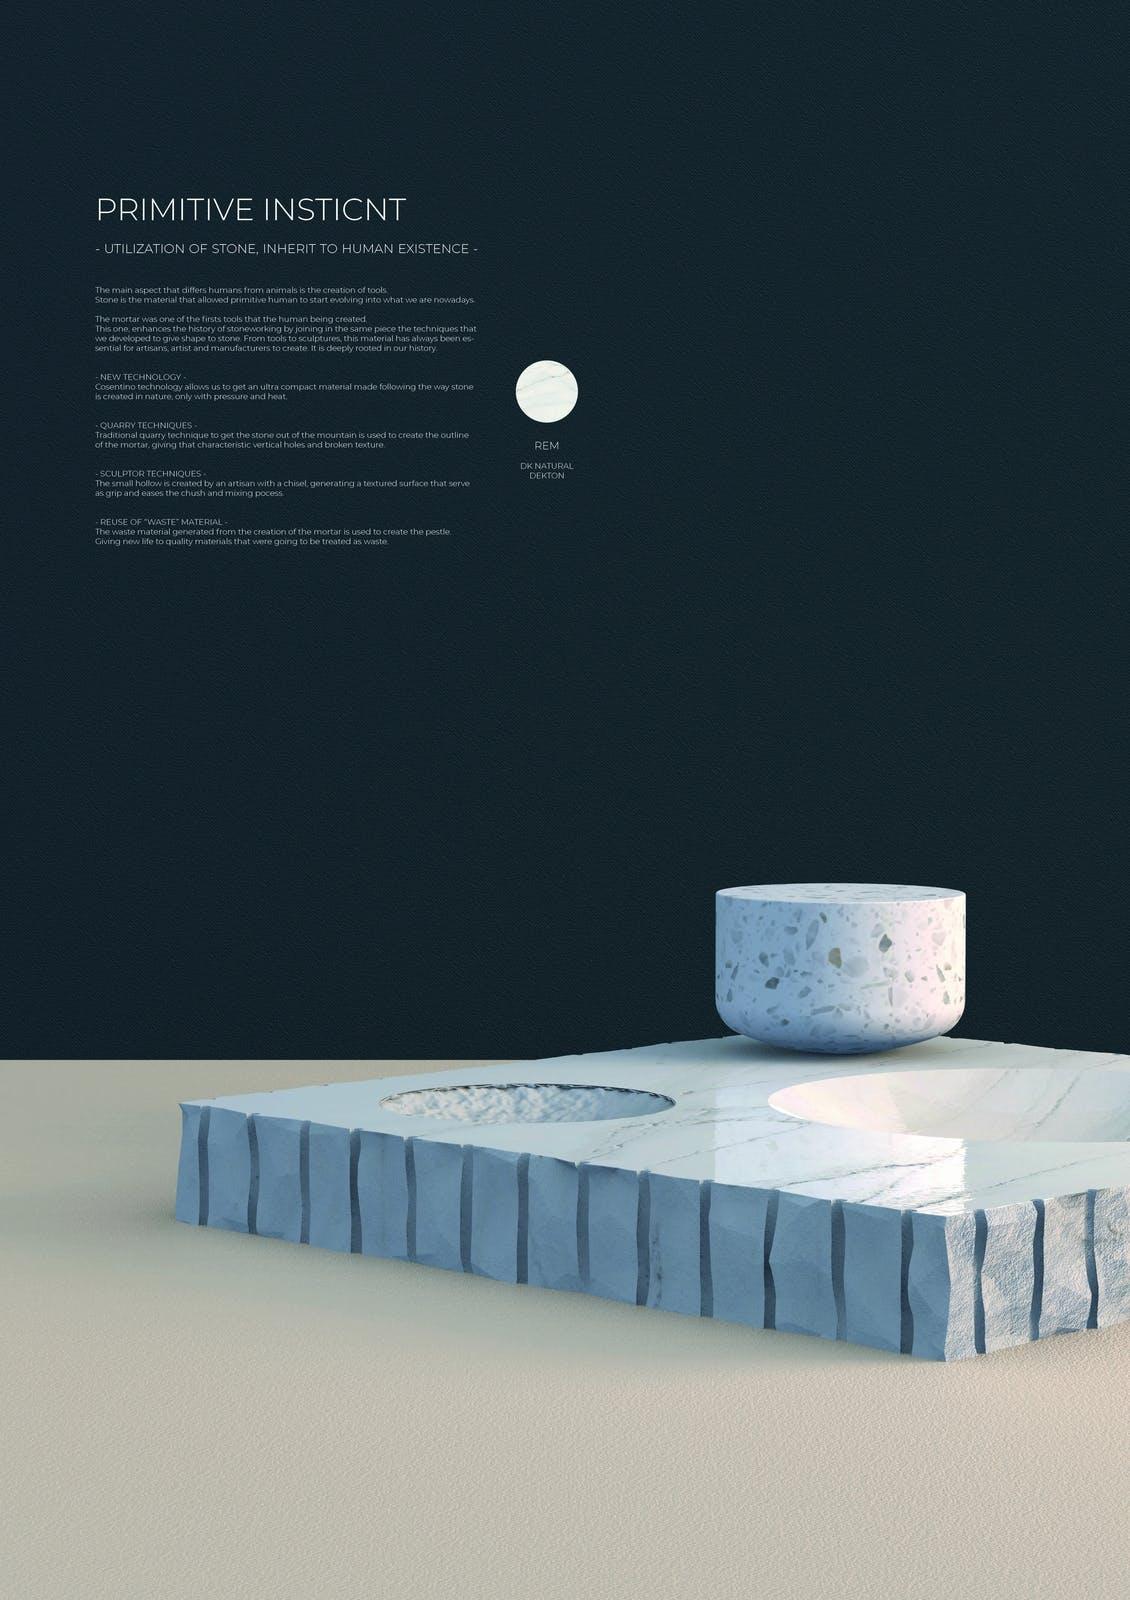 Image of 149 Primitive Instinct s in Cosentino Design Challenge 14 winners - Cosentino